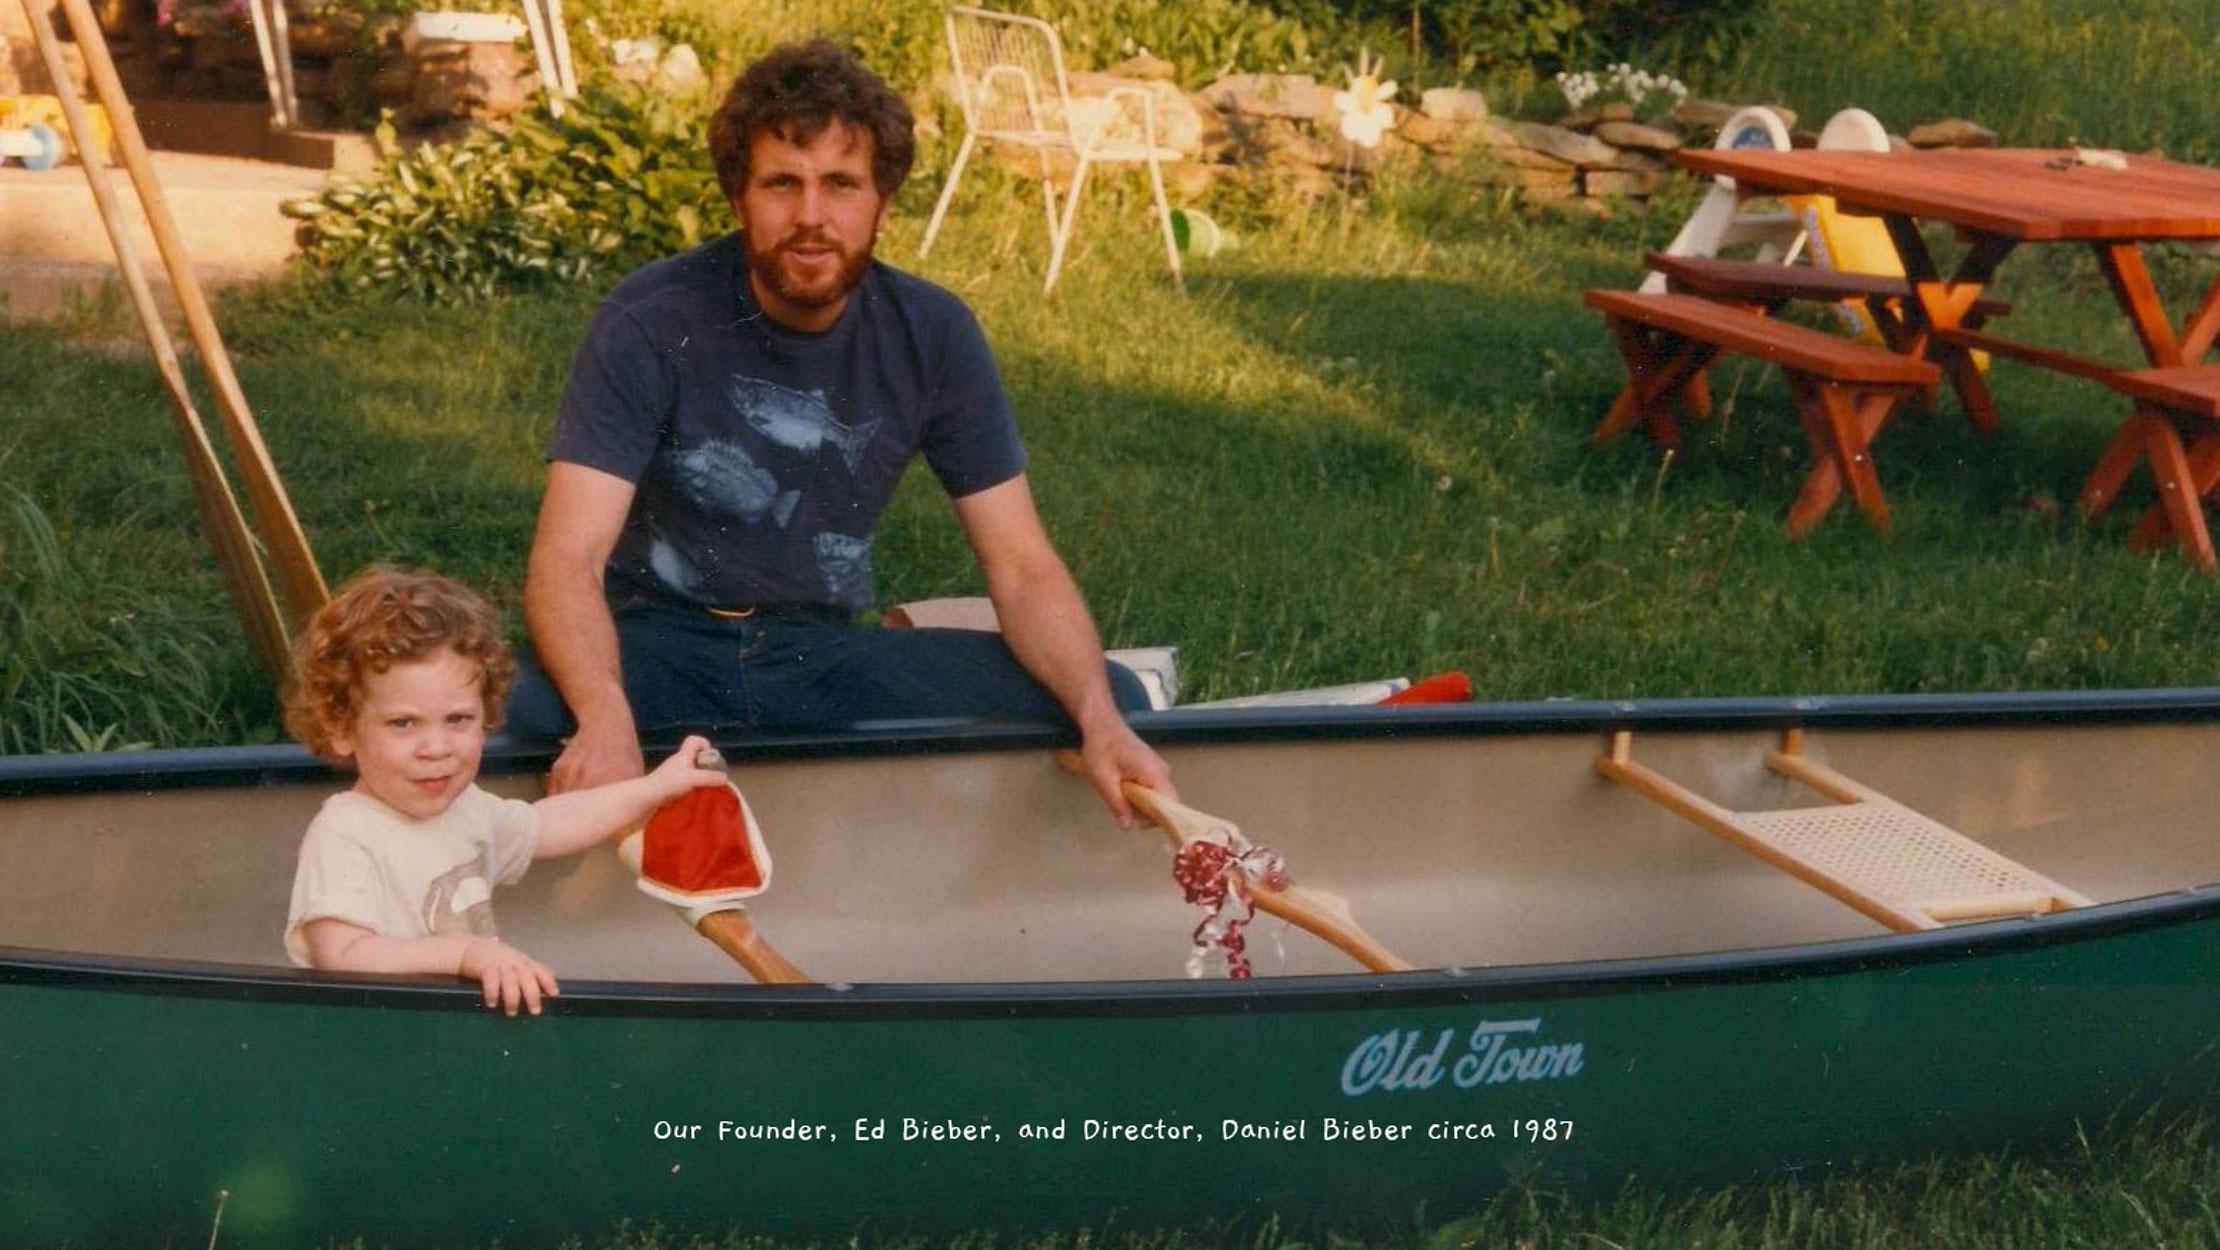 Our Founder, Ed Bieber, and Director, Daniel Bieber circa 1987